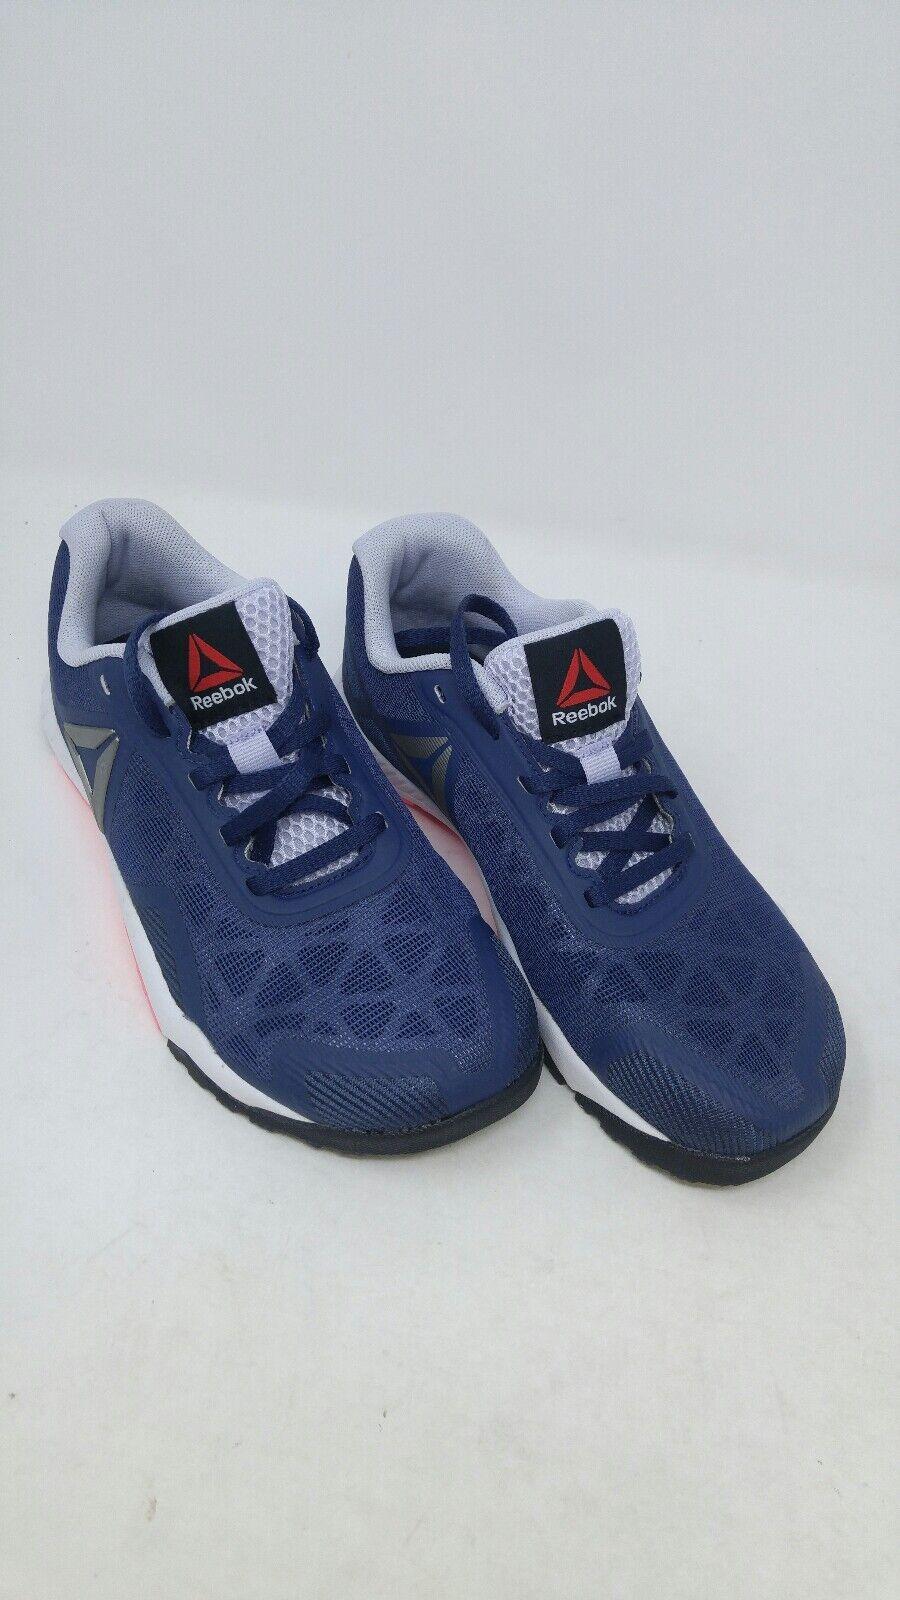 Reebok Women's Workout 2.0 shoes bluee Pink Size 5